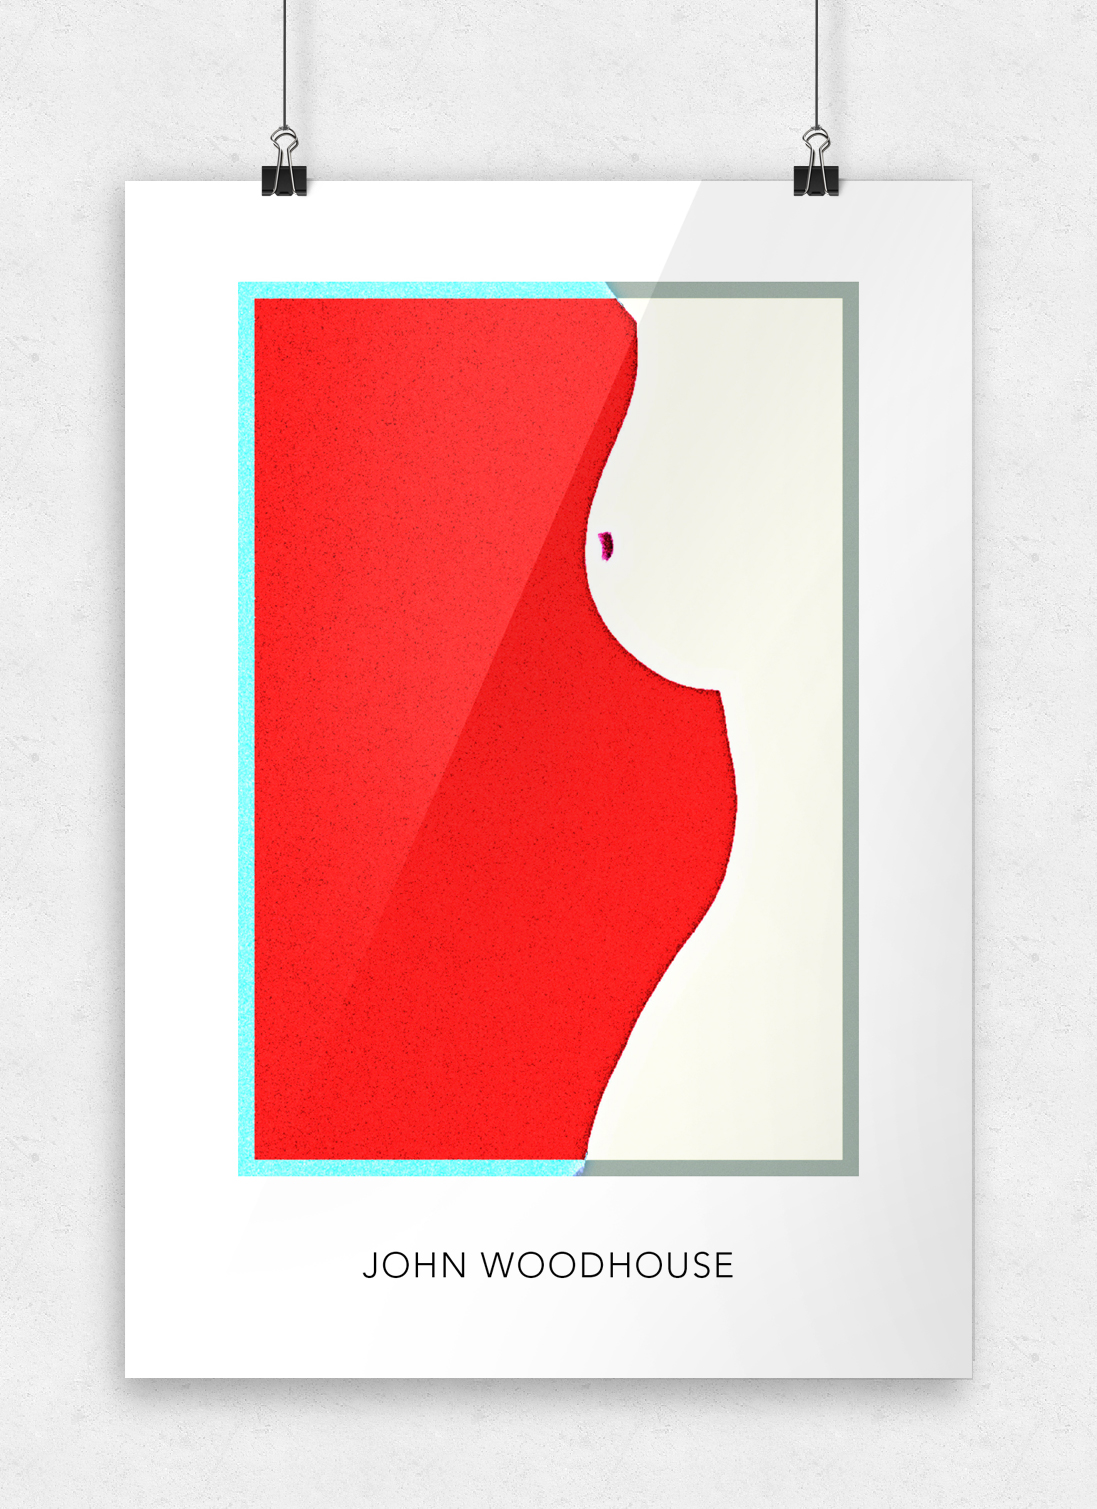 JW-Posters-Template_14.jpg